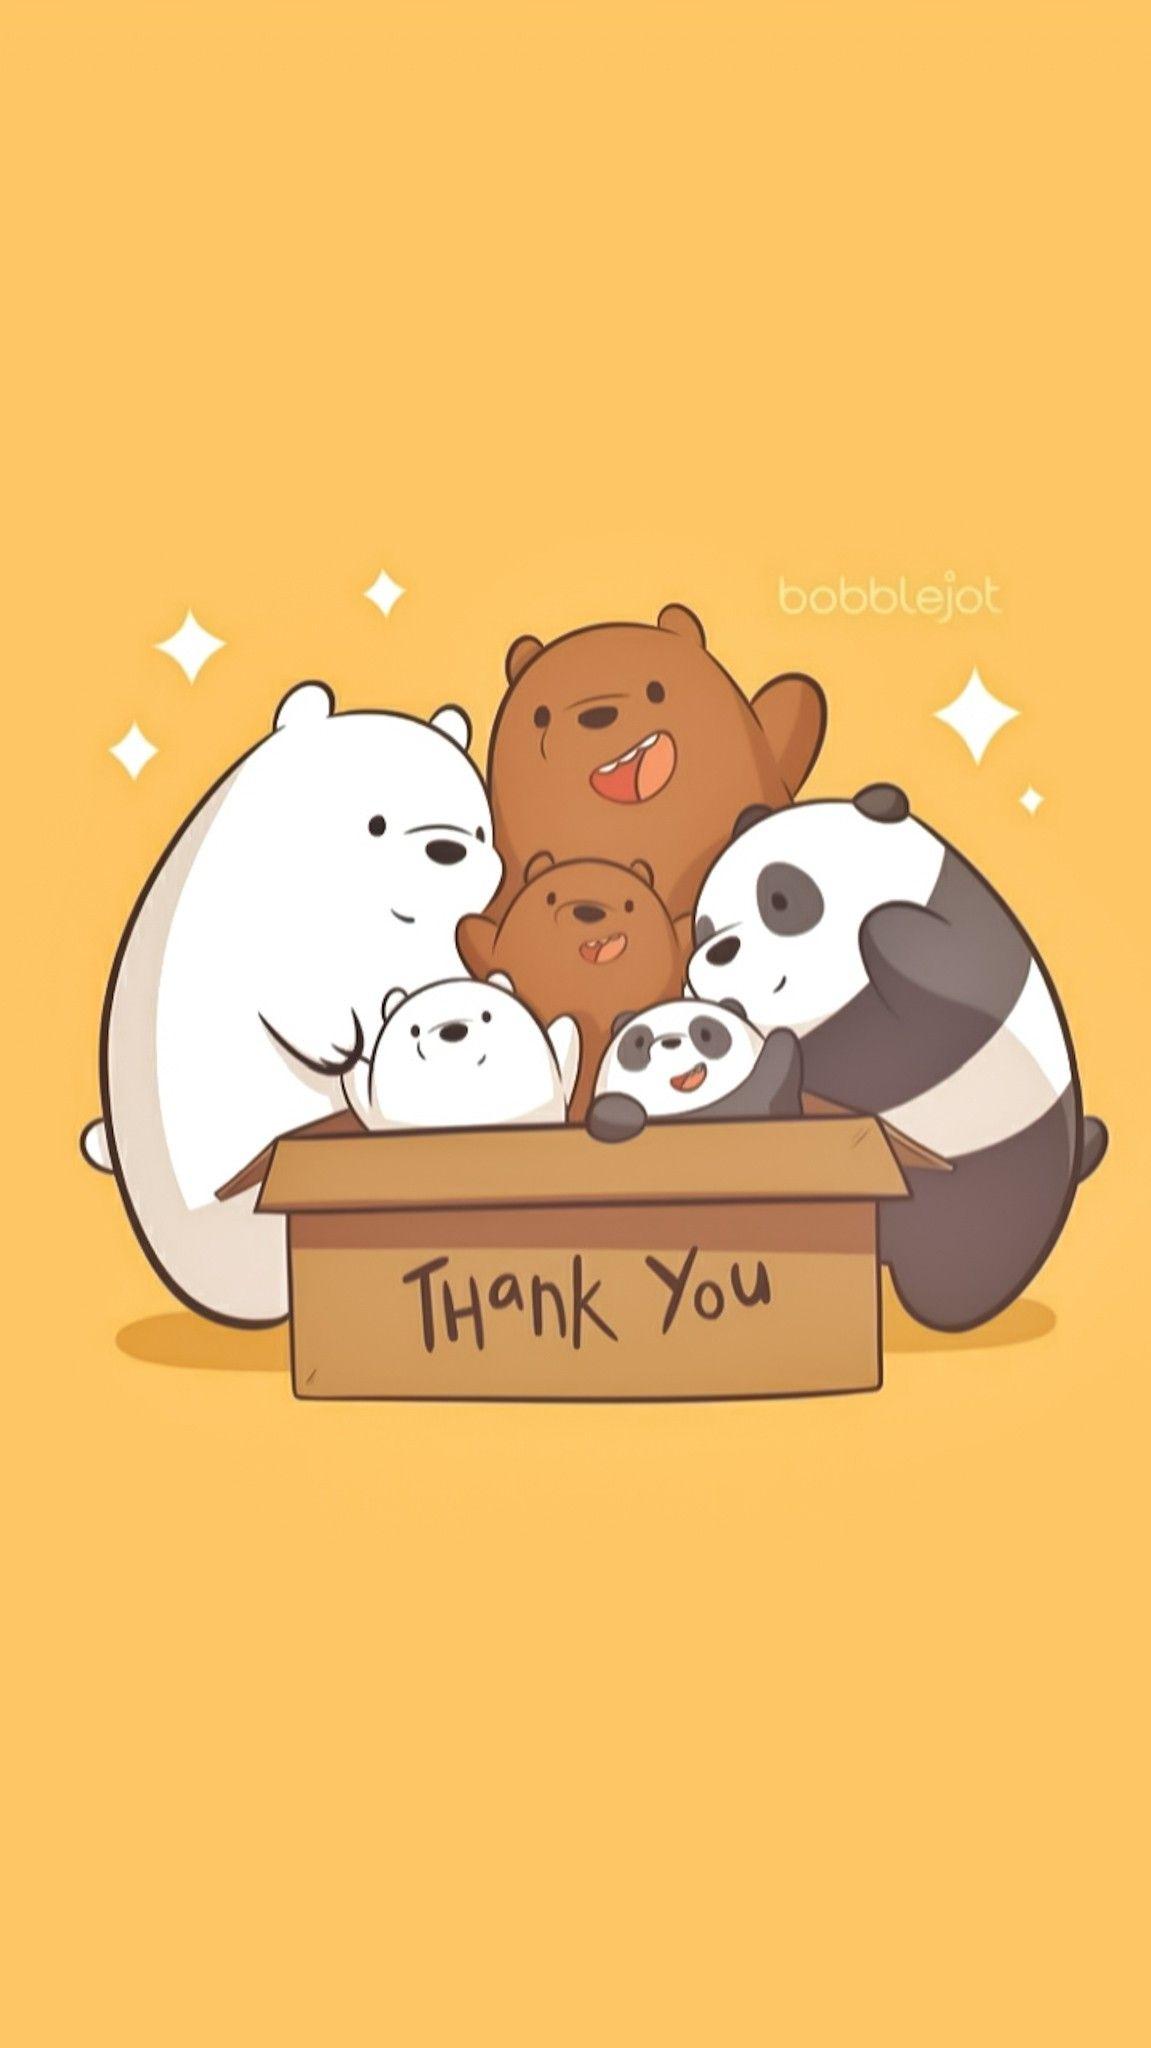 Pin Oleh Ulyana Fedorchuk Di We Bear Bears Boneka Hewan Kartun Ilustrasi Karakter